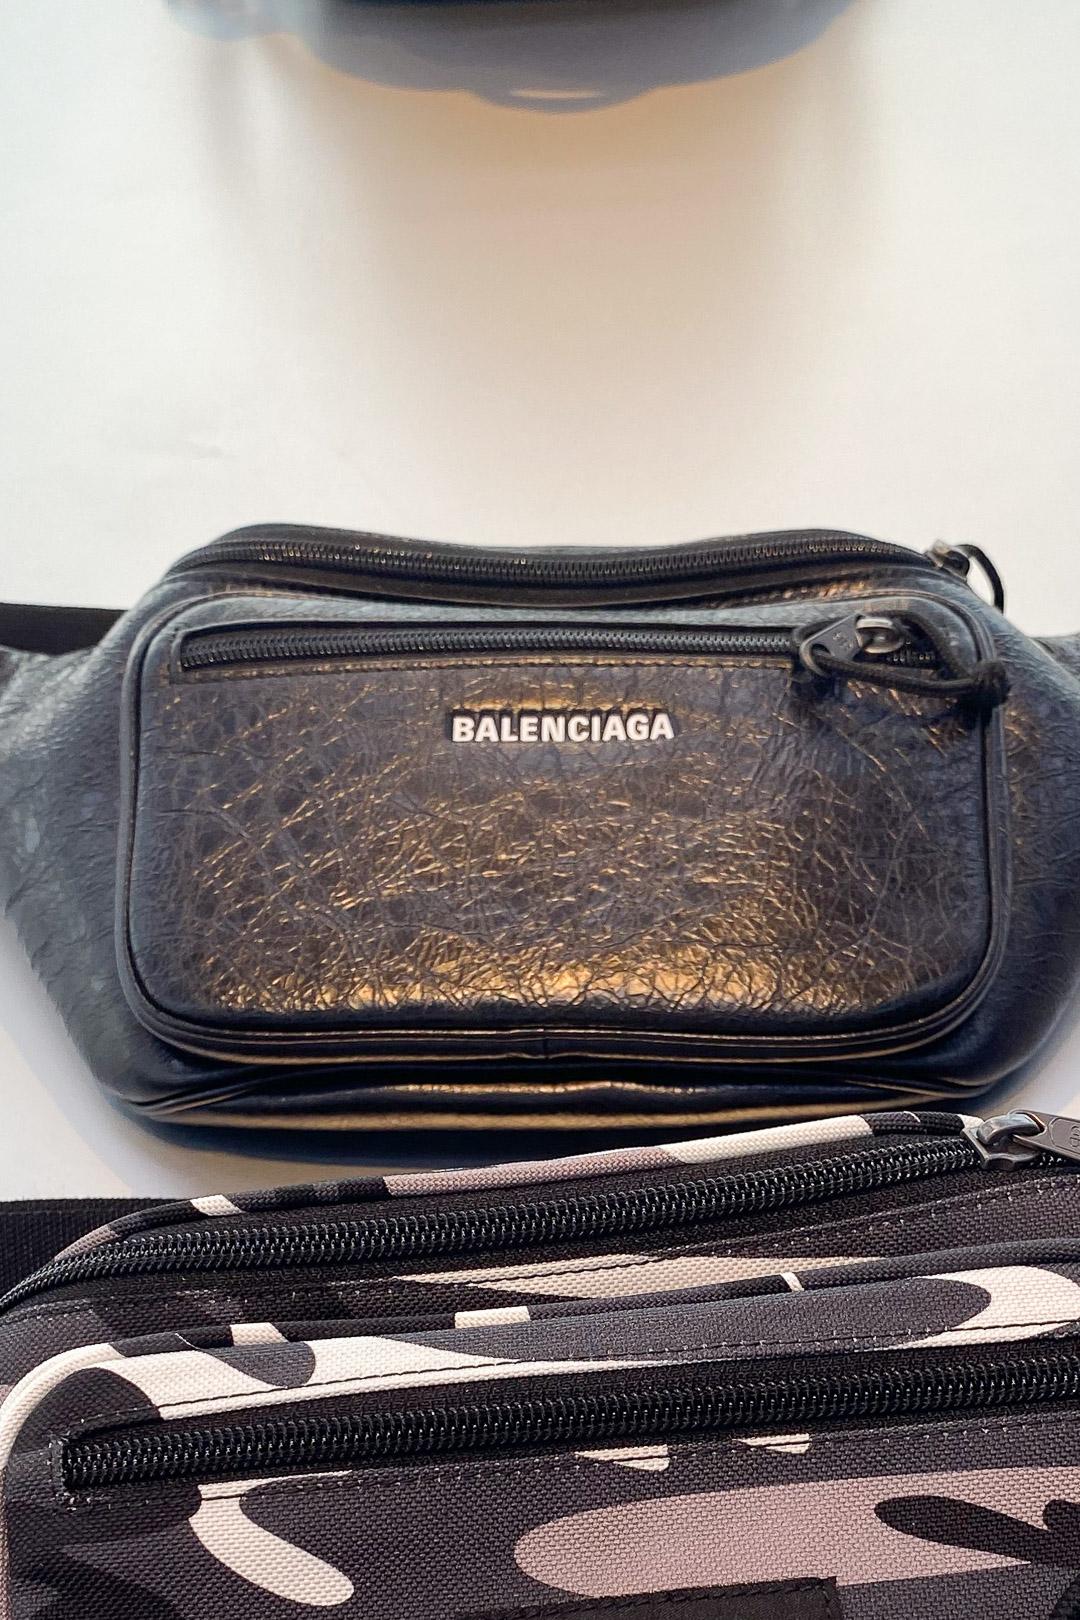 Balenciaga Men's Explorer Beltbag in Black Lambskin